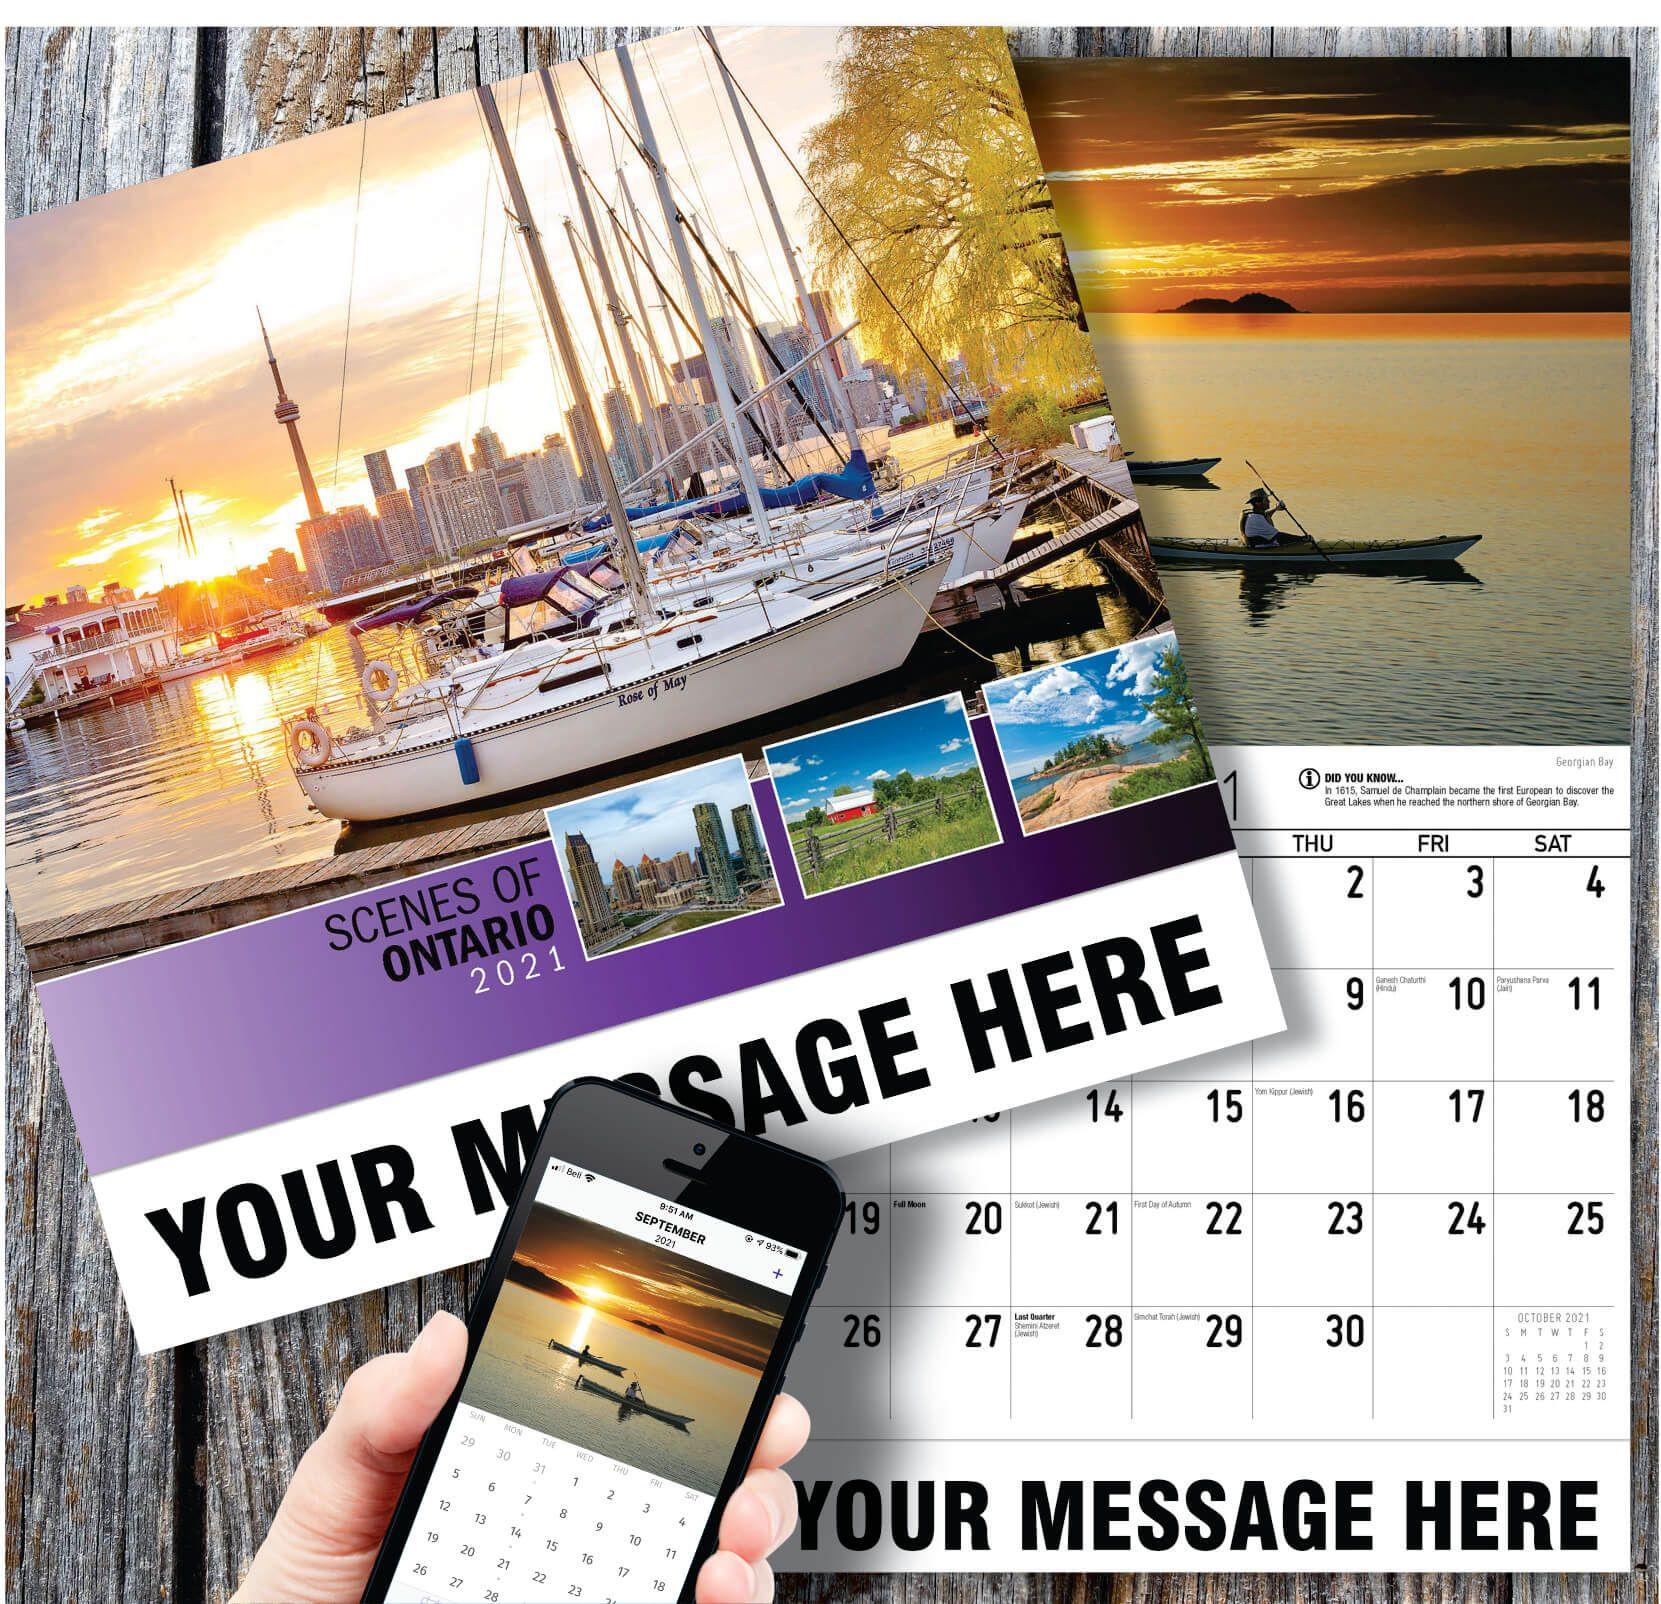 Scenes Of Ontario In 2020 Promotional Calendar Ontario Calendar App